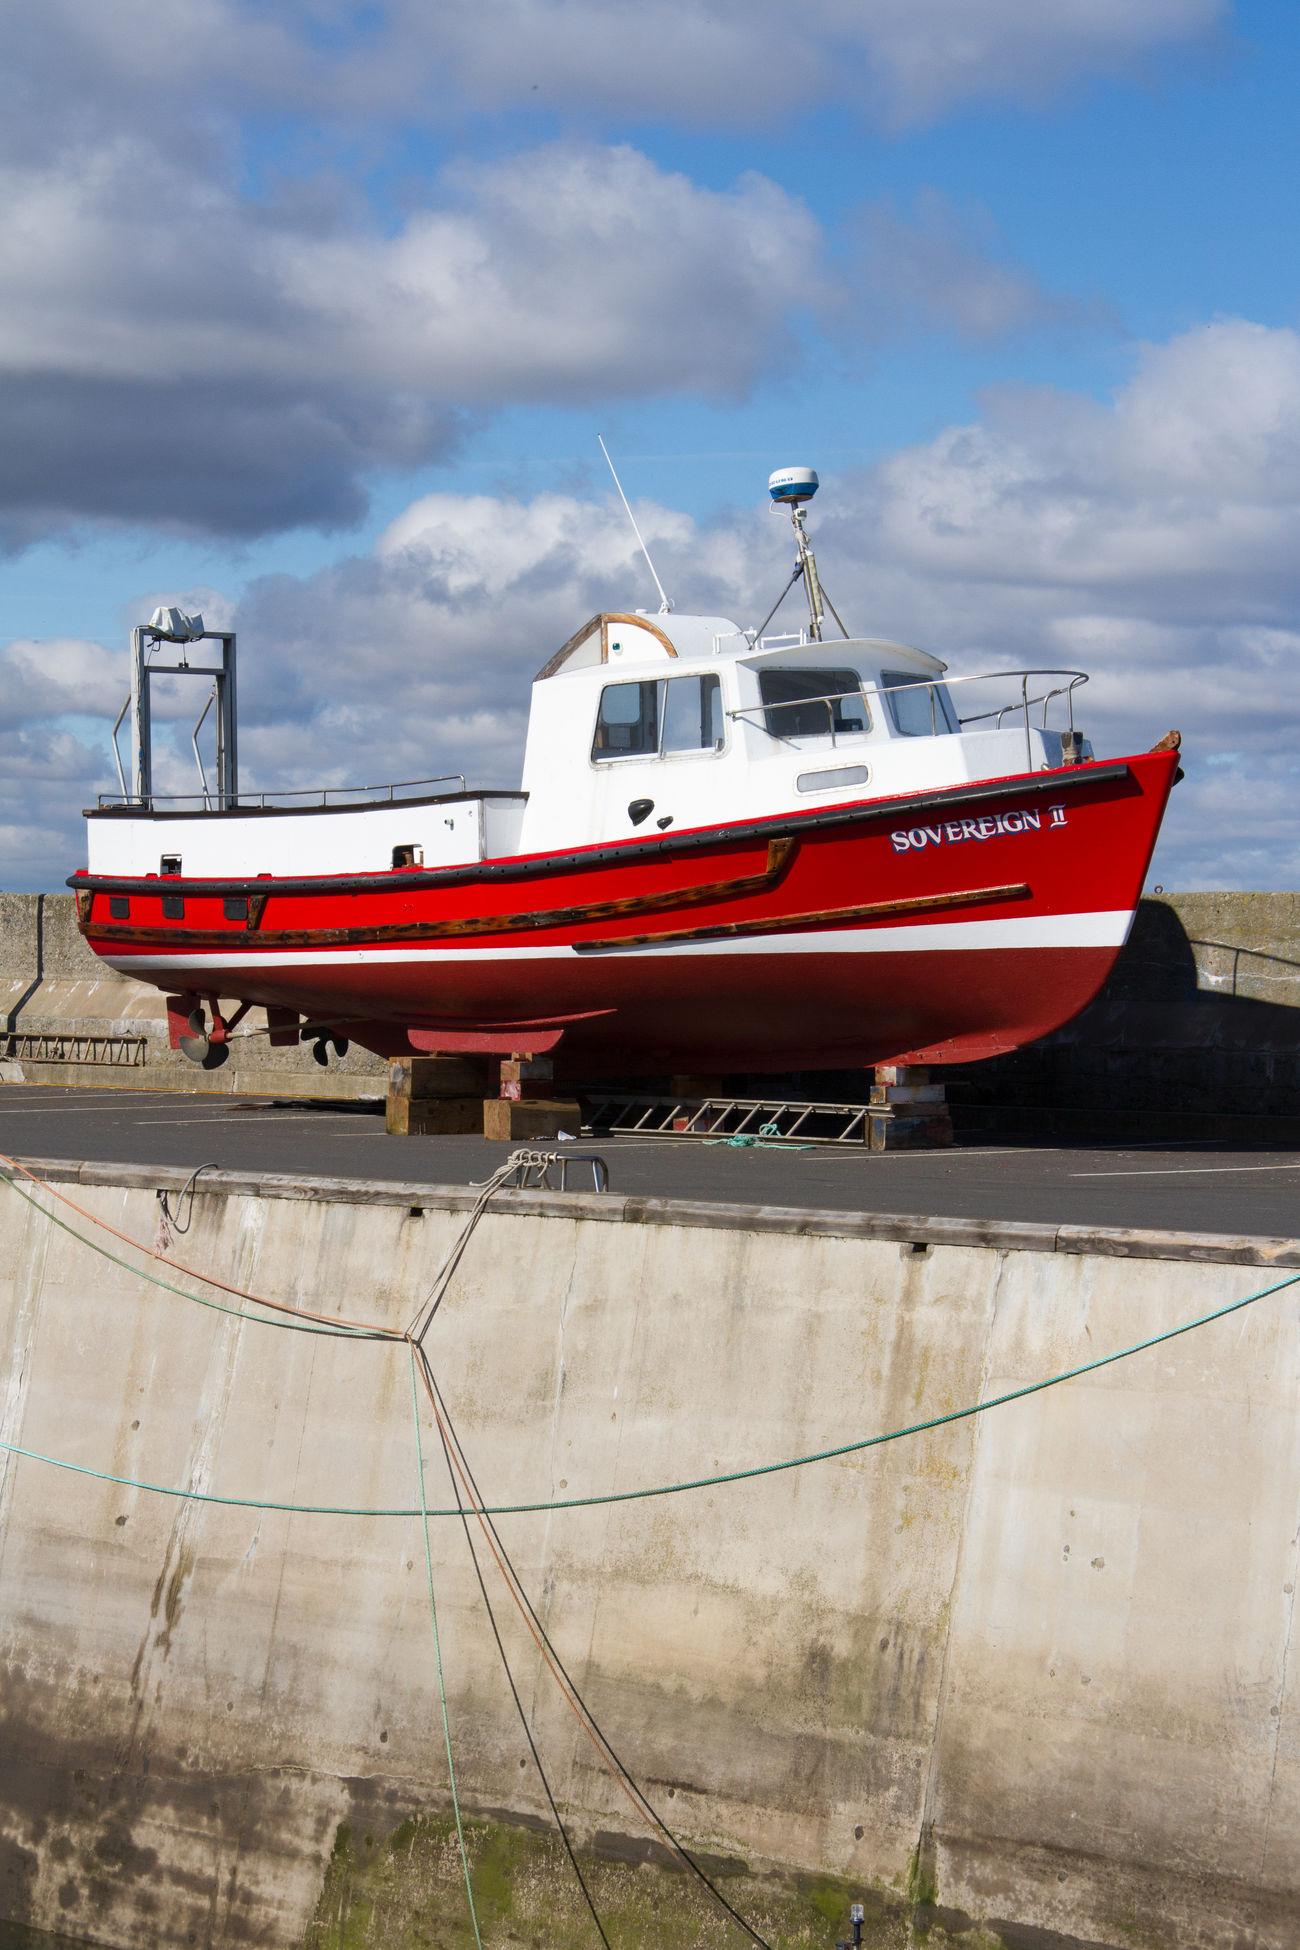 Boat, Dry Dock Fishing Boat Harbour Port Red Seaside Transport Dock